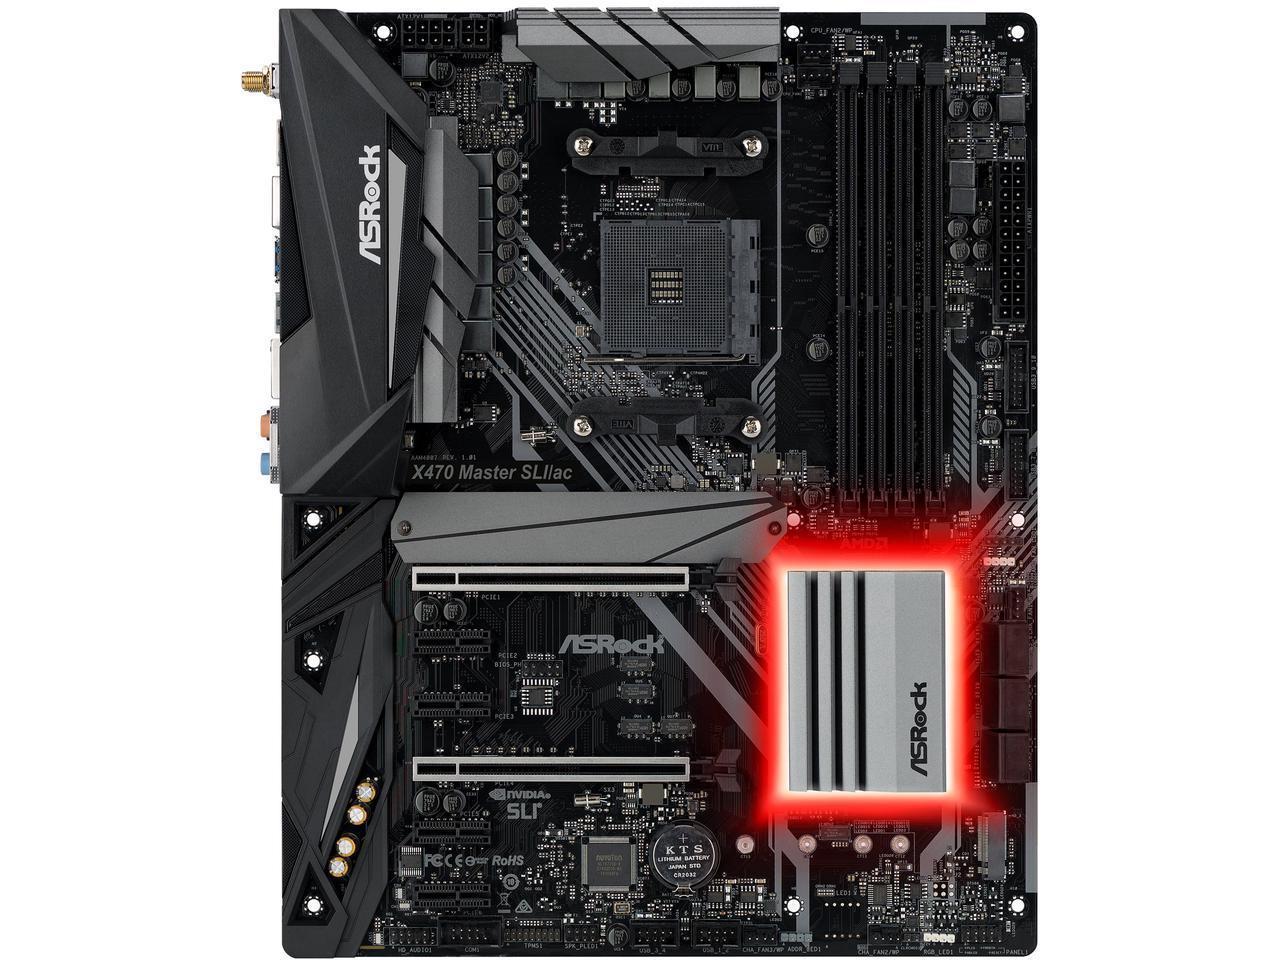 ASRock X470 Master  AM4 AMD Promontory X470 SATA 6Gb/s USB 3.1 HDMI ATX AMD Motherboard $100 AR @Newegg